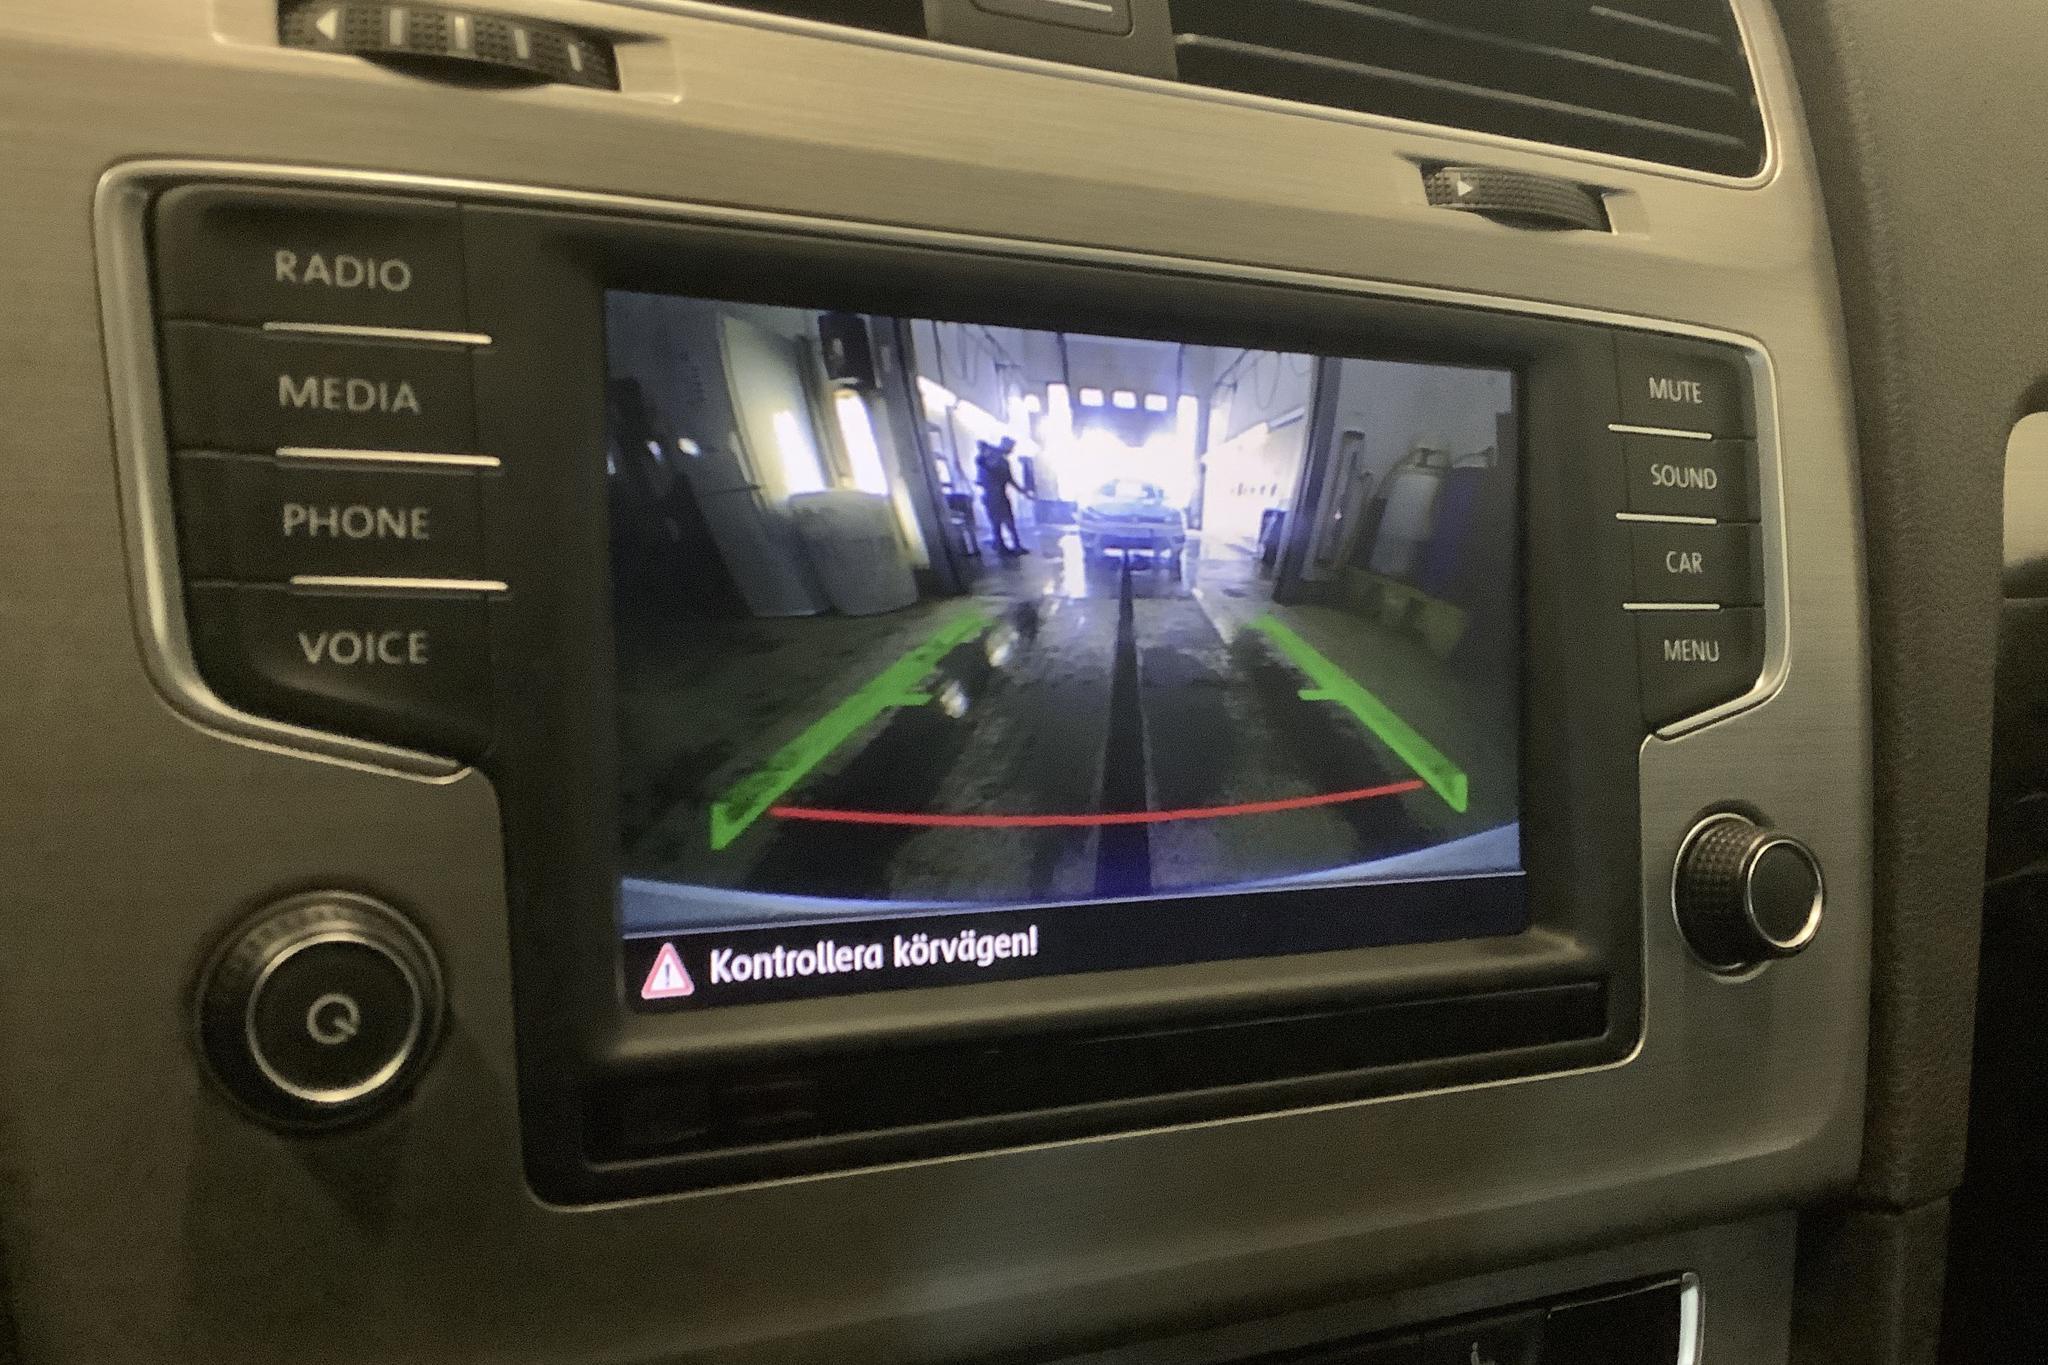 VW Golf VII 1.2 TSI Sportscombi (110hk) - 2 709 mil - Manuell - vit - 2017